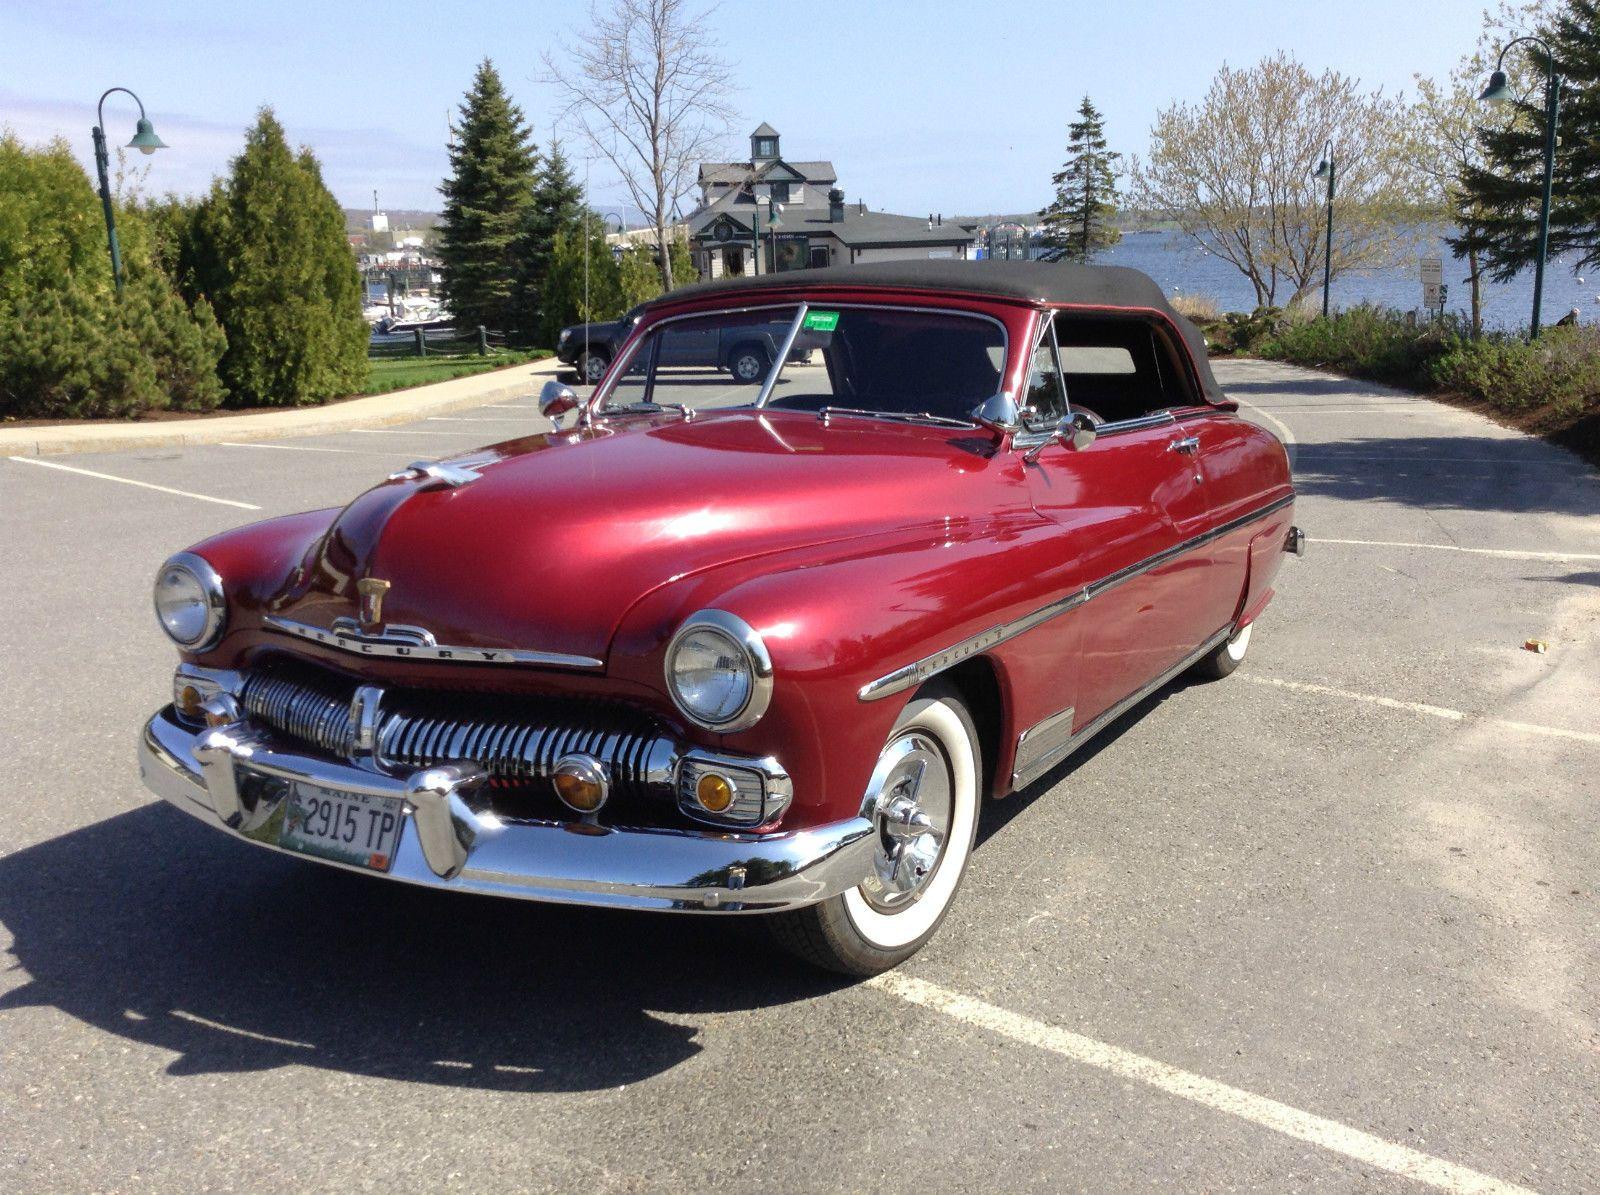 1950 Mercury Custom Convertible - CarBiid.com | Classic Cars for ...